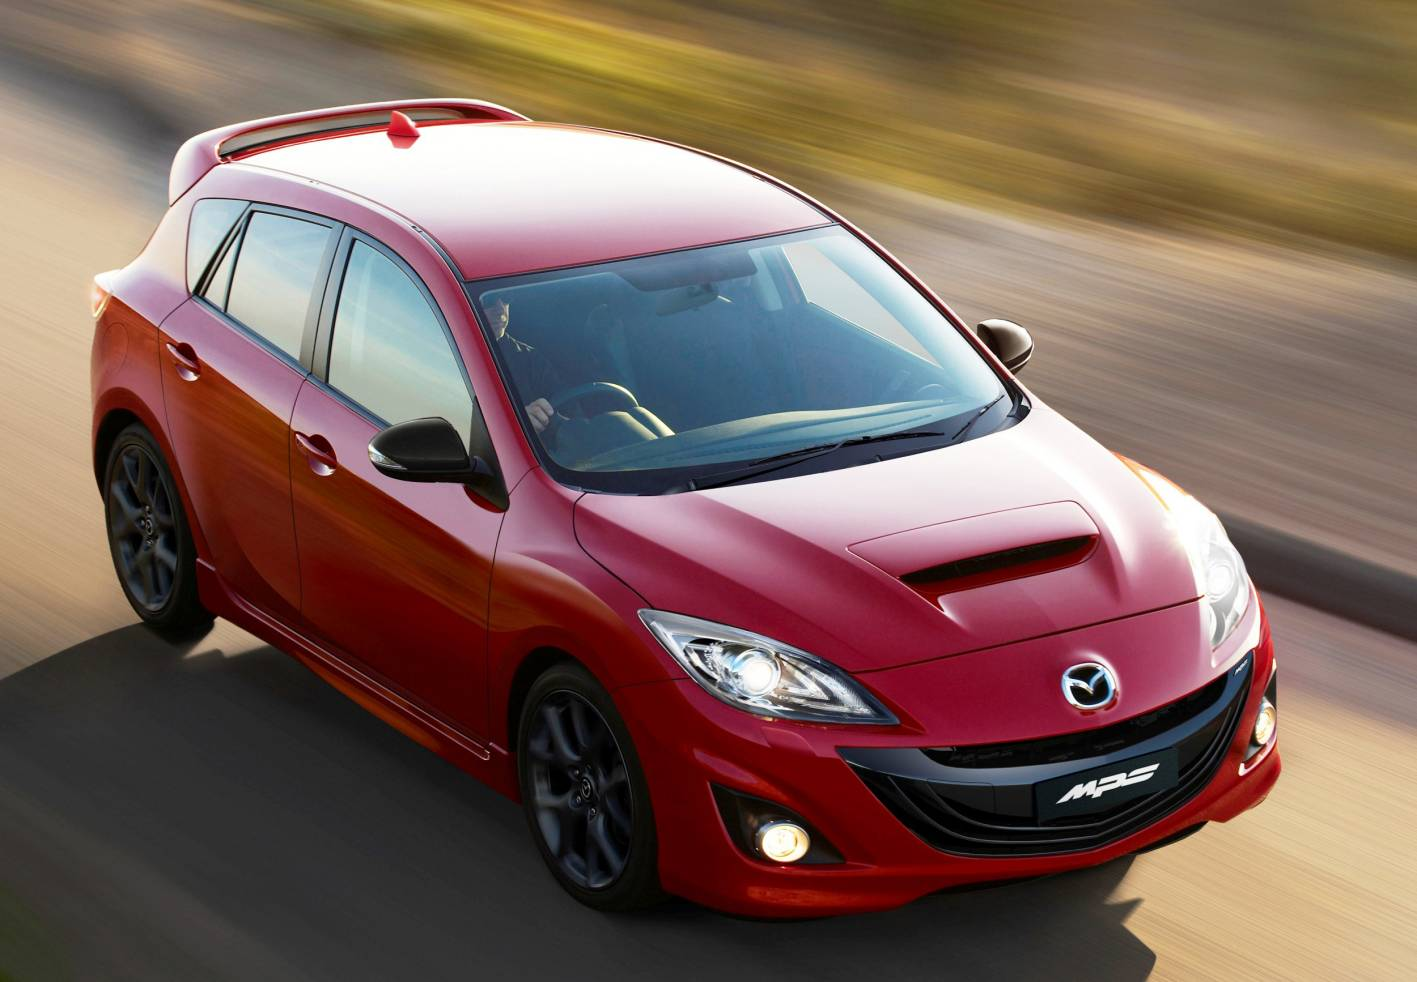 http://performancedrive.com.au/wp-content/uploads/2012/10/Mazda3-MPS.jpg